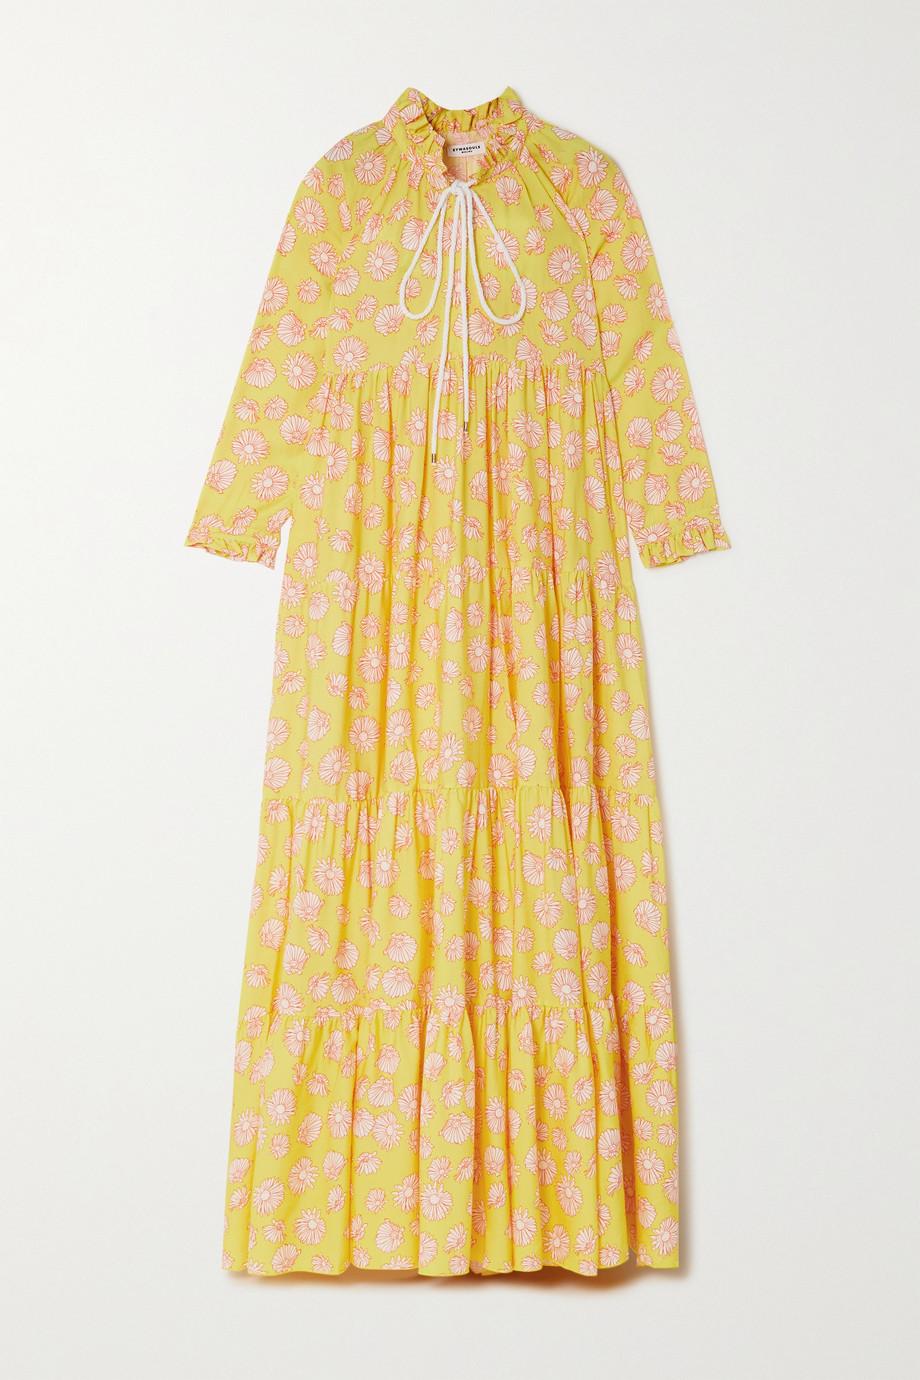 Eywasouls Malibu Robe longue en serge de Lyocell TENCEL à imprimé fleuri Cora